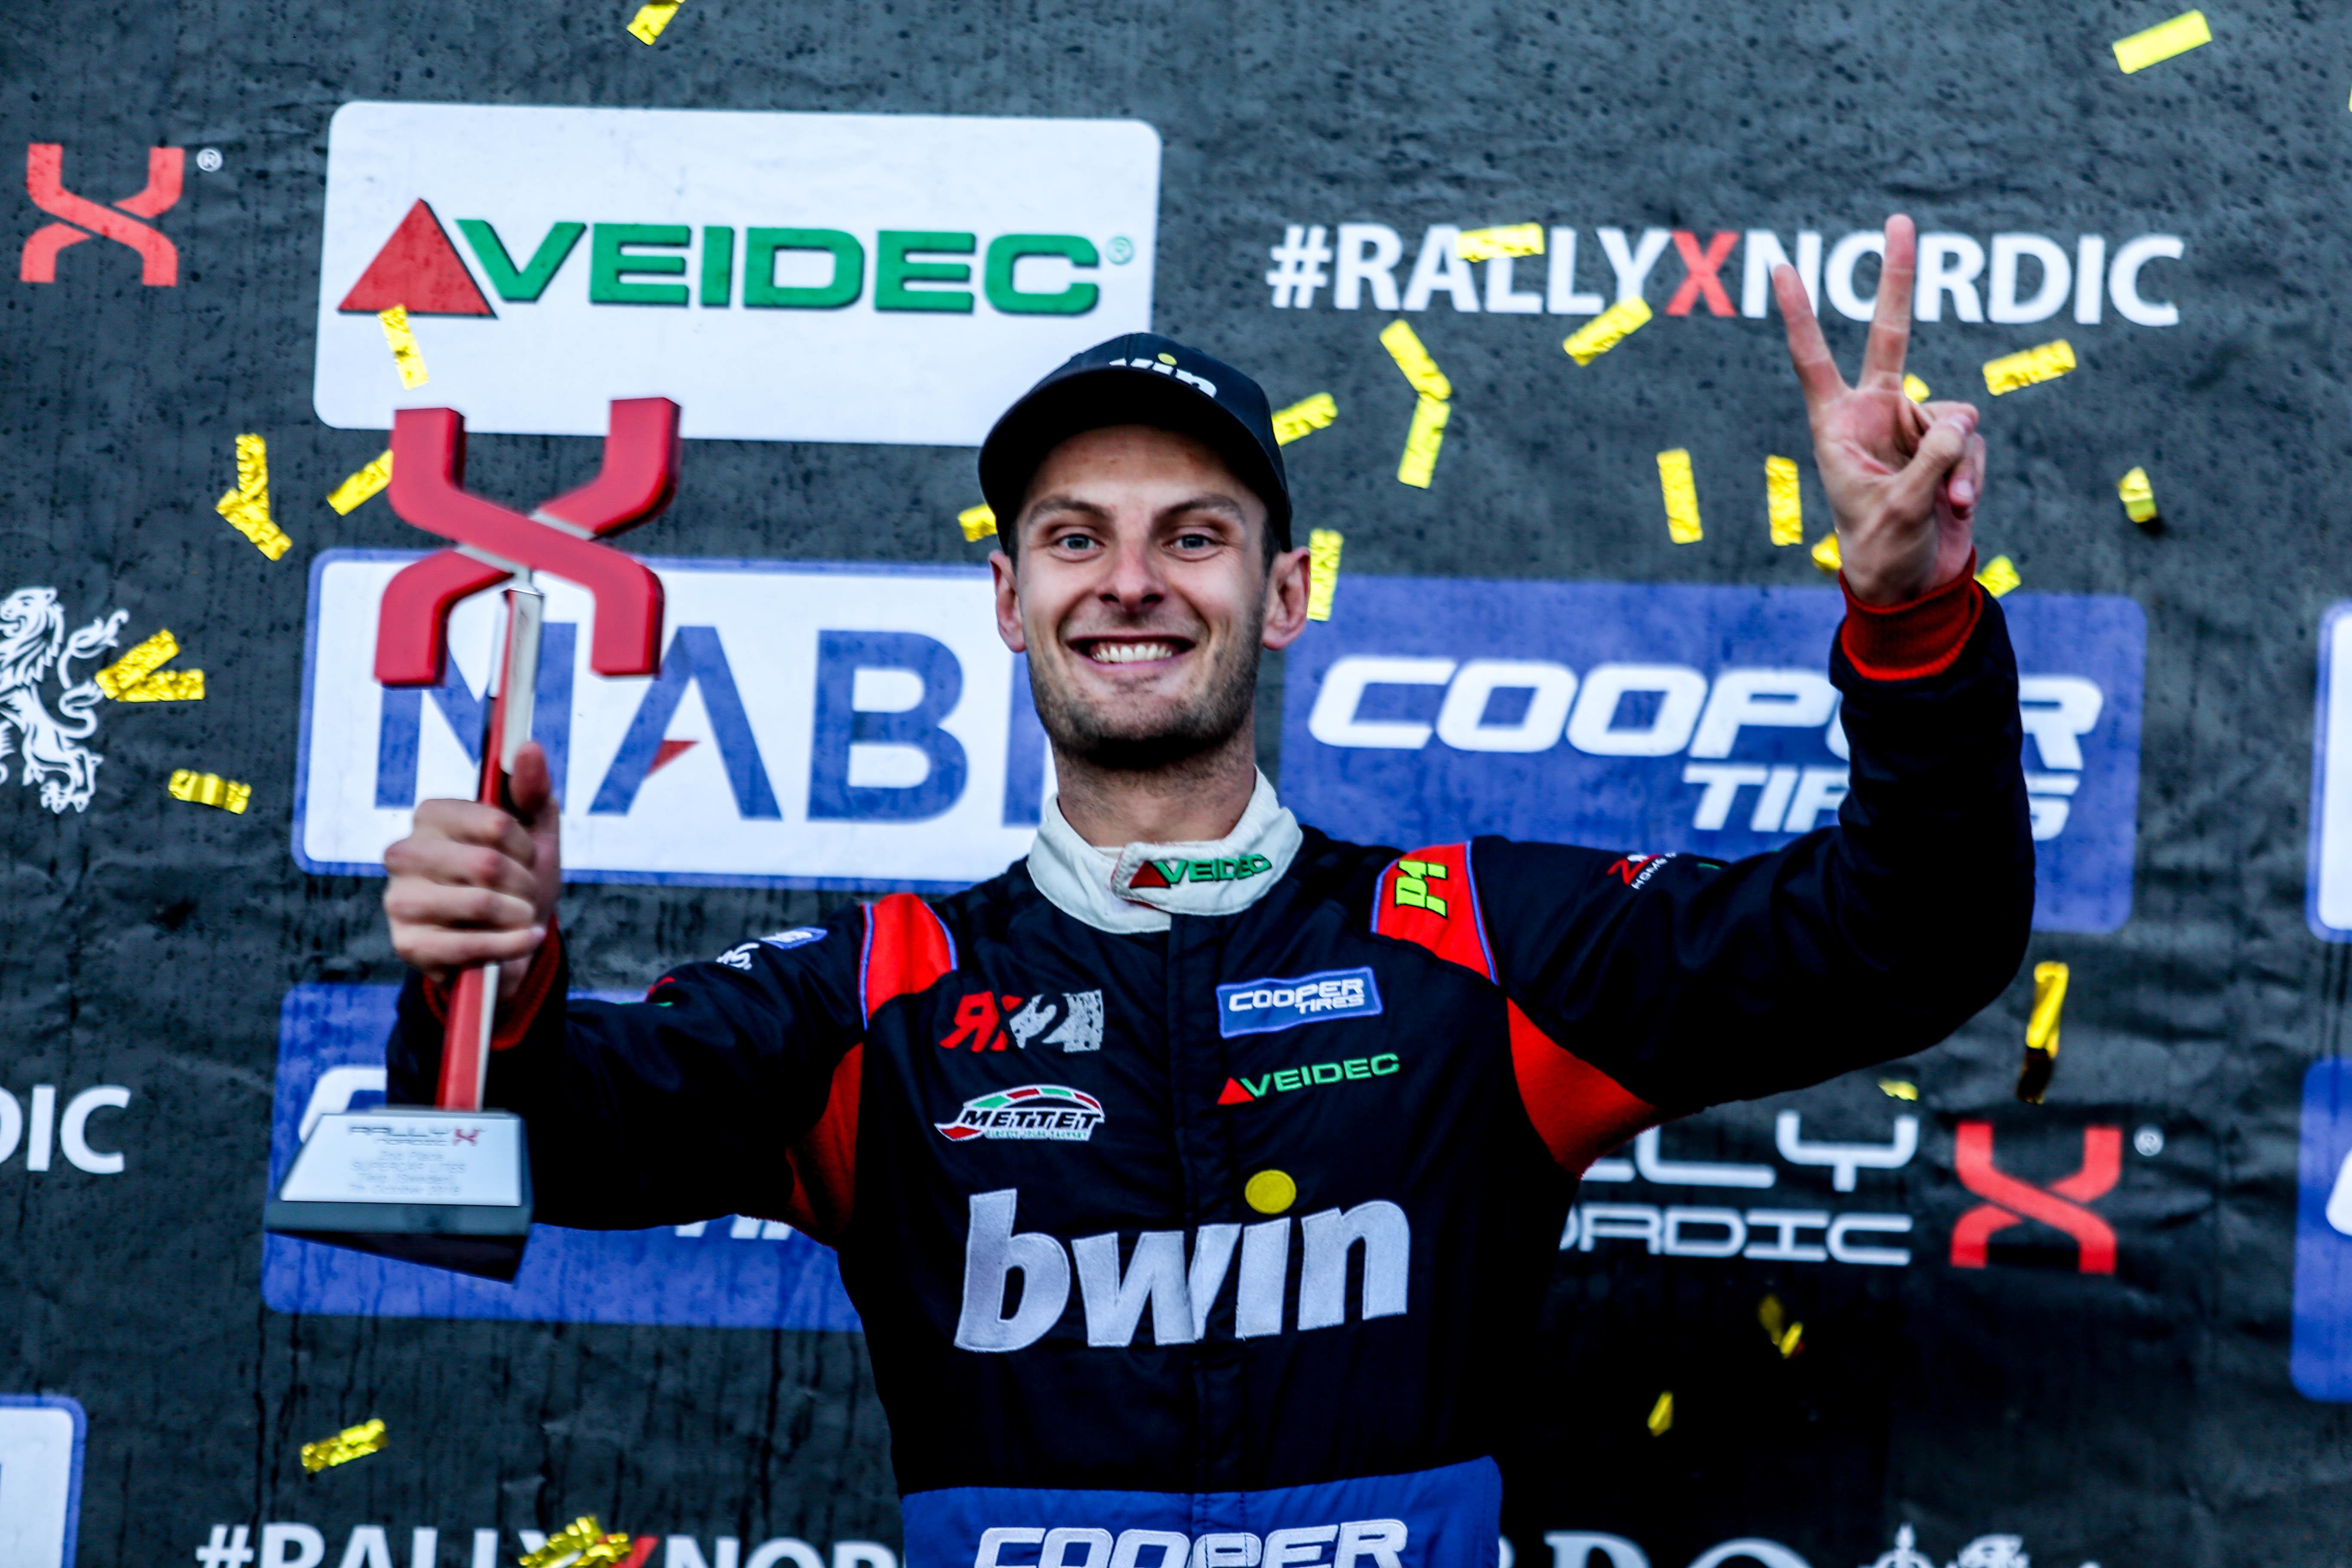 Guillaume De Ridder RallyX Nordic-kampioen!